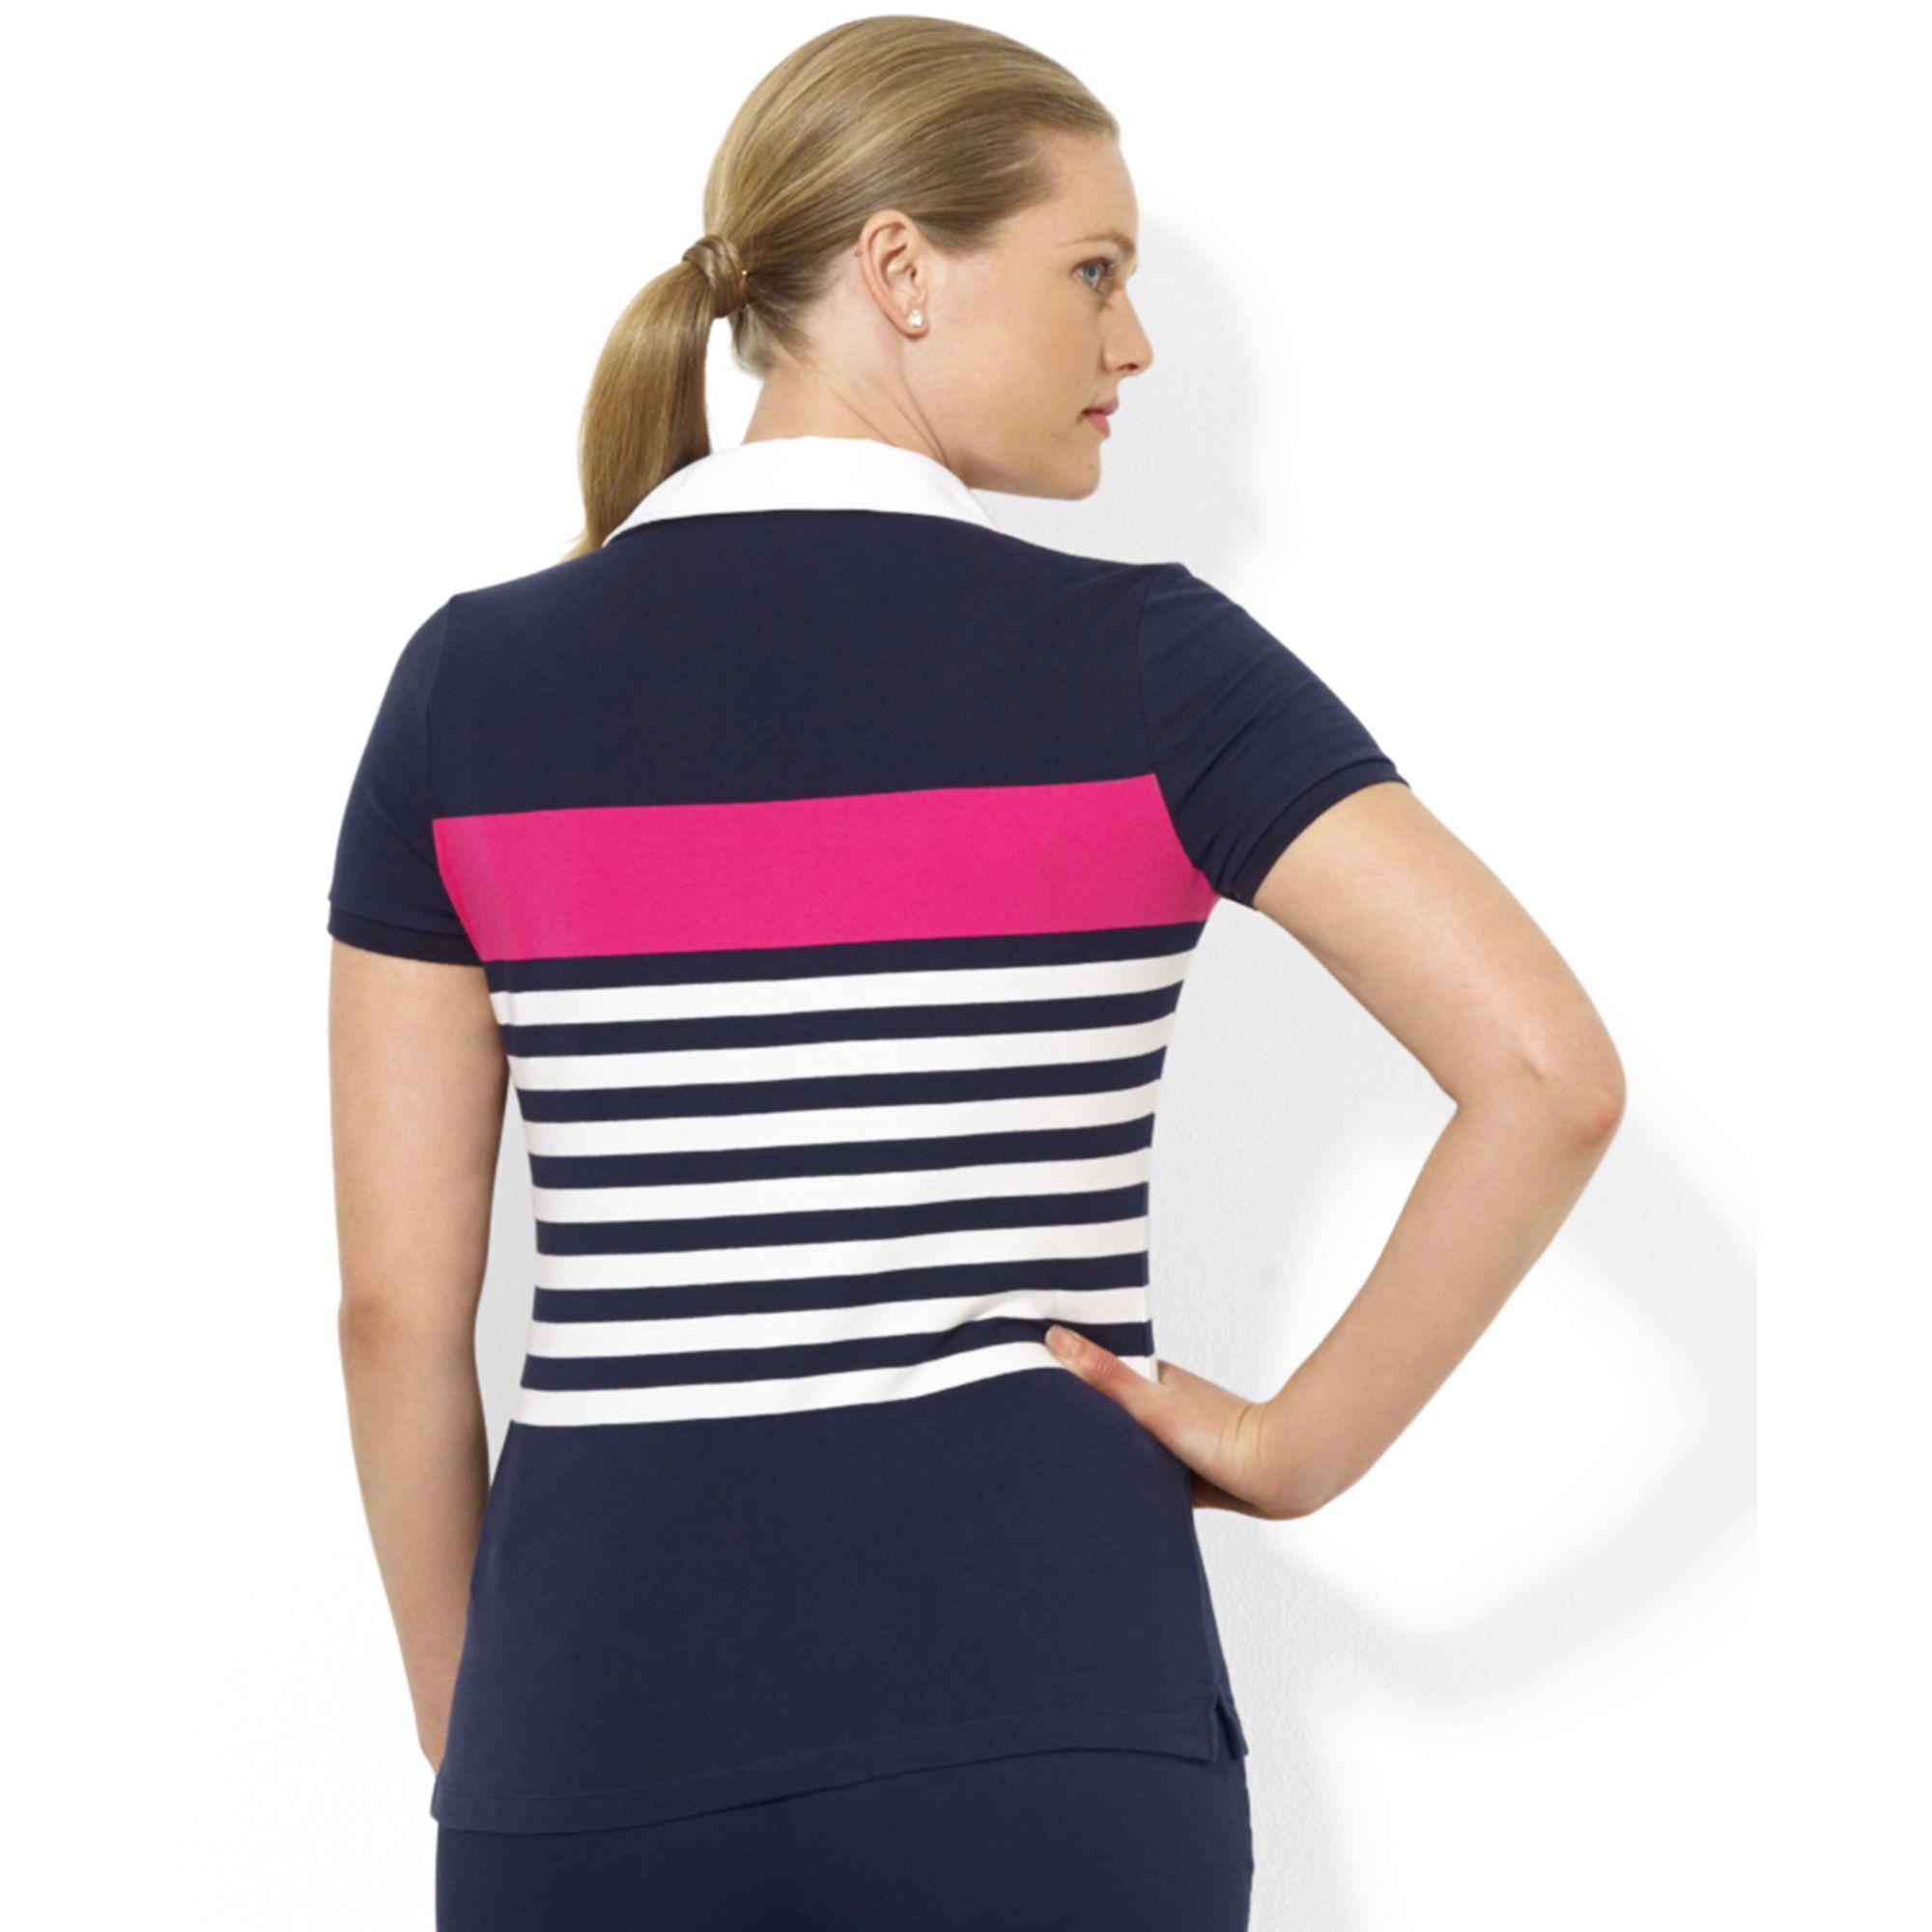 4185f9b3dc8 Lyst - Lauren By Ralph Lauren Plus Size Shortsleeve Striped Polo ...